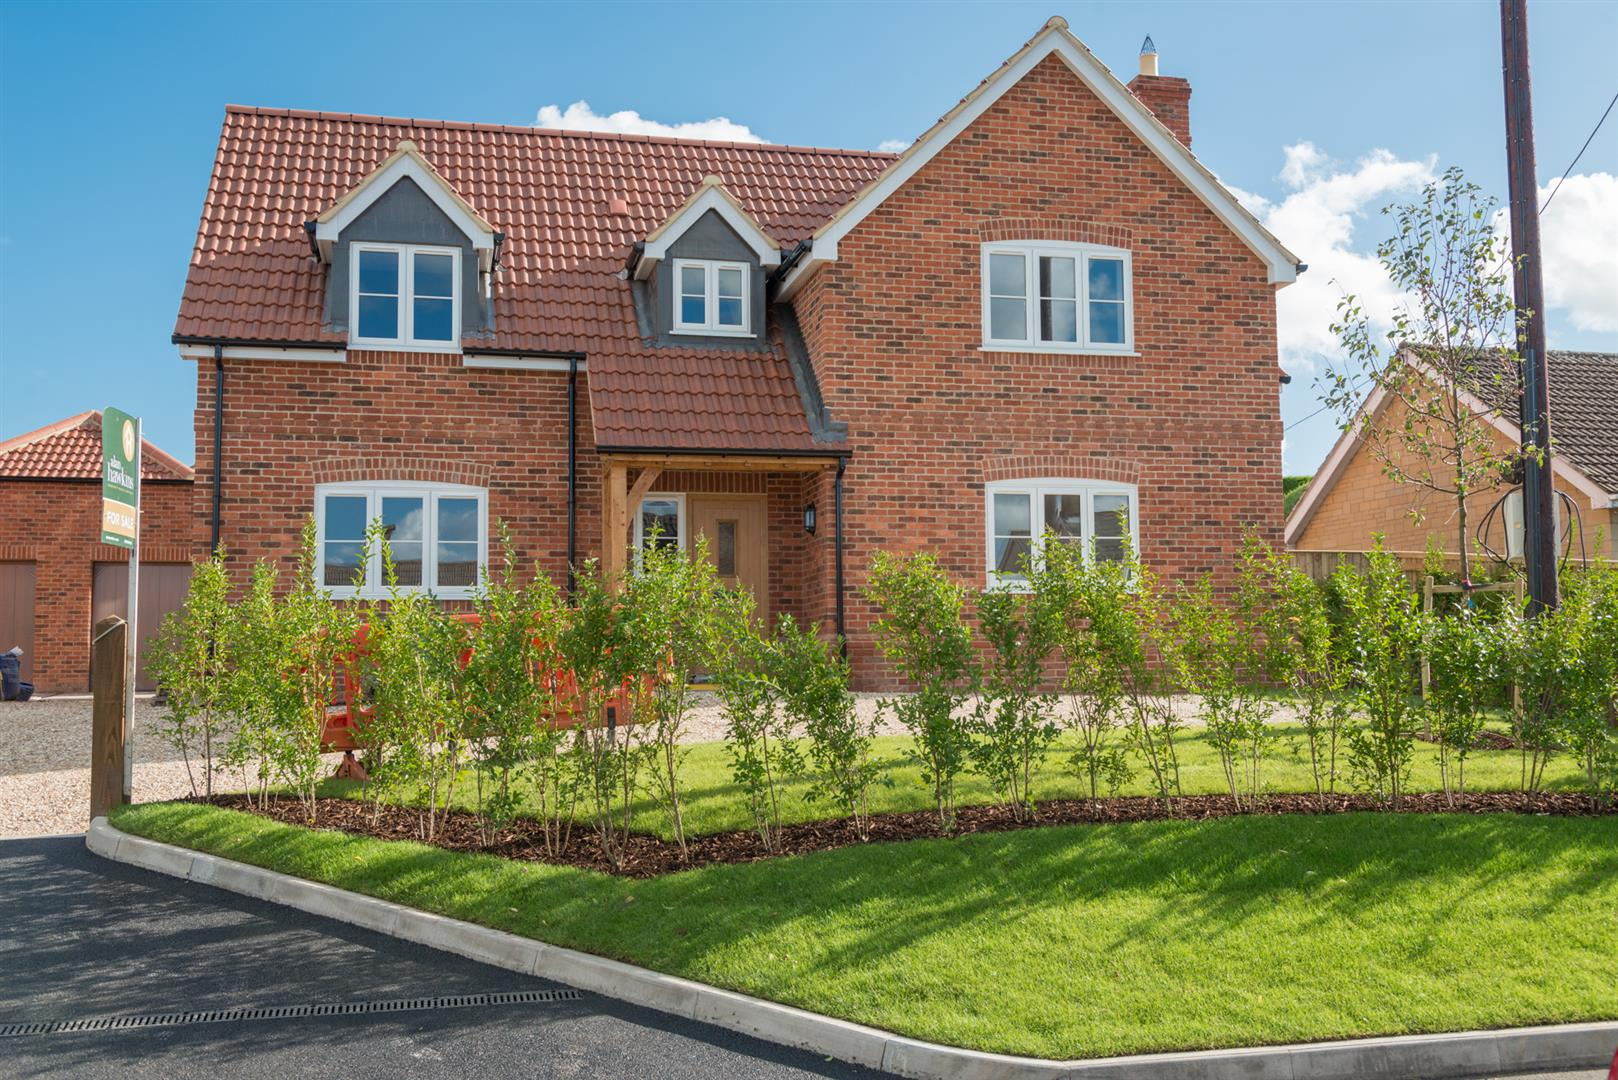 4 Bedrooms Detached House for sale in Bradenstoke, Chippenham SN15